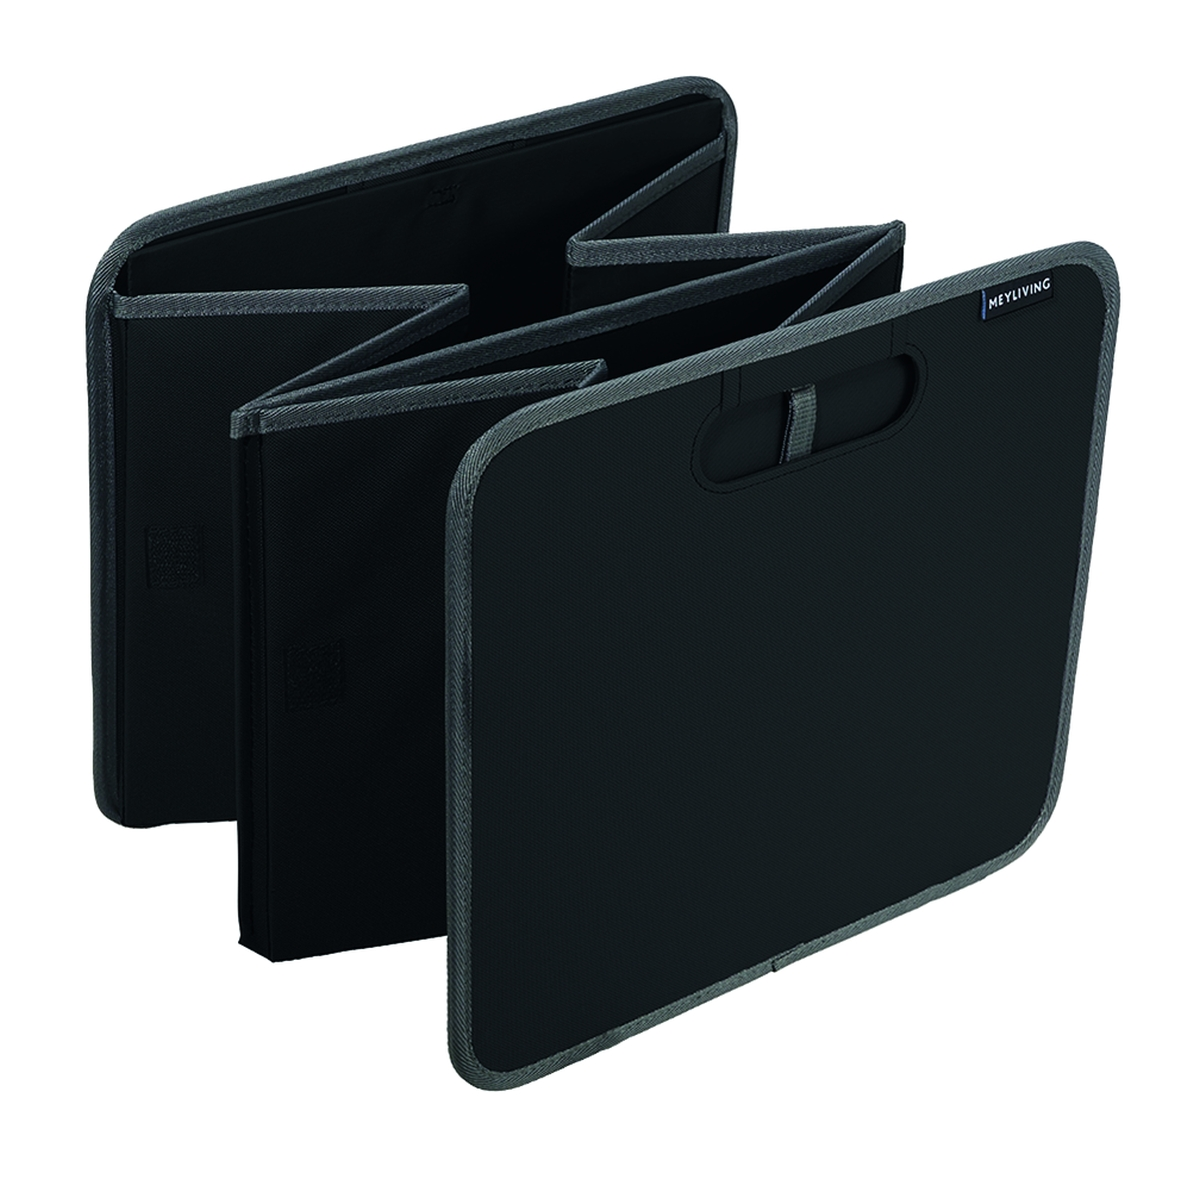 Meori Faltbox Meyliving XL Black